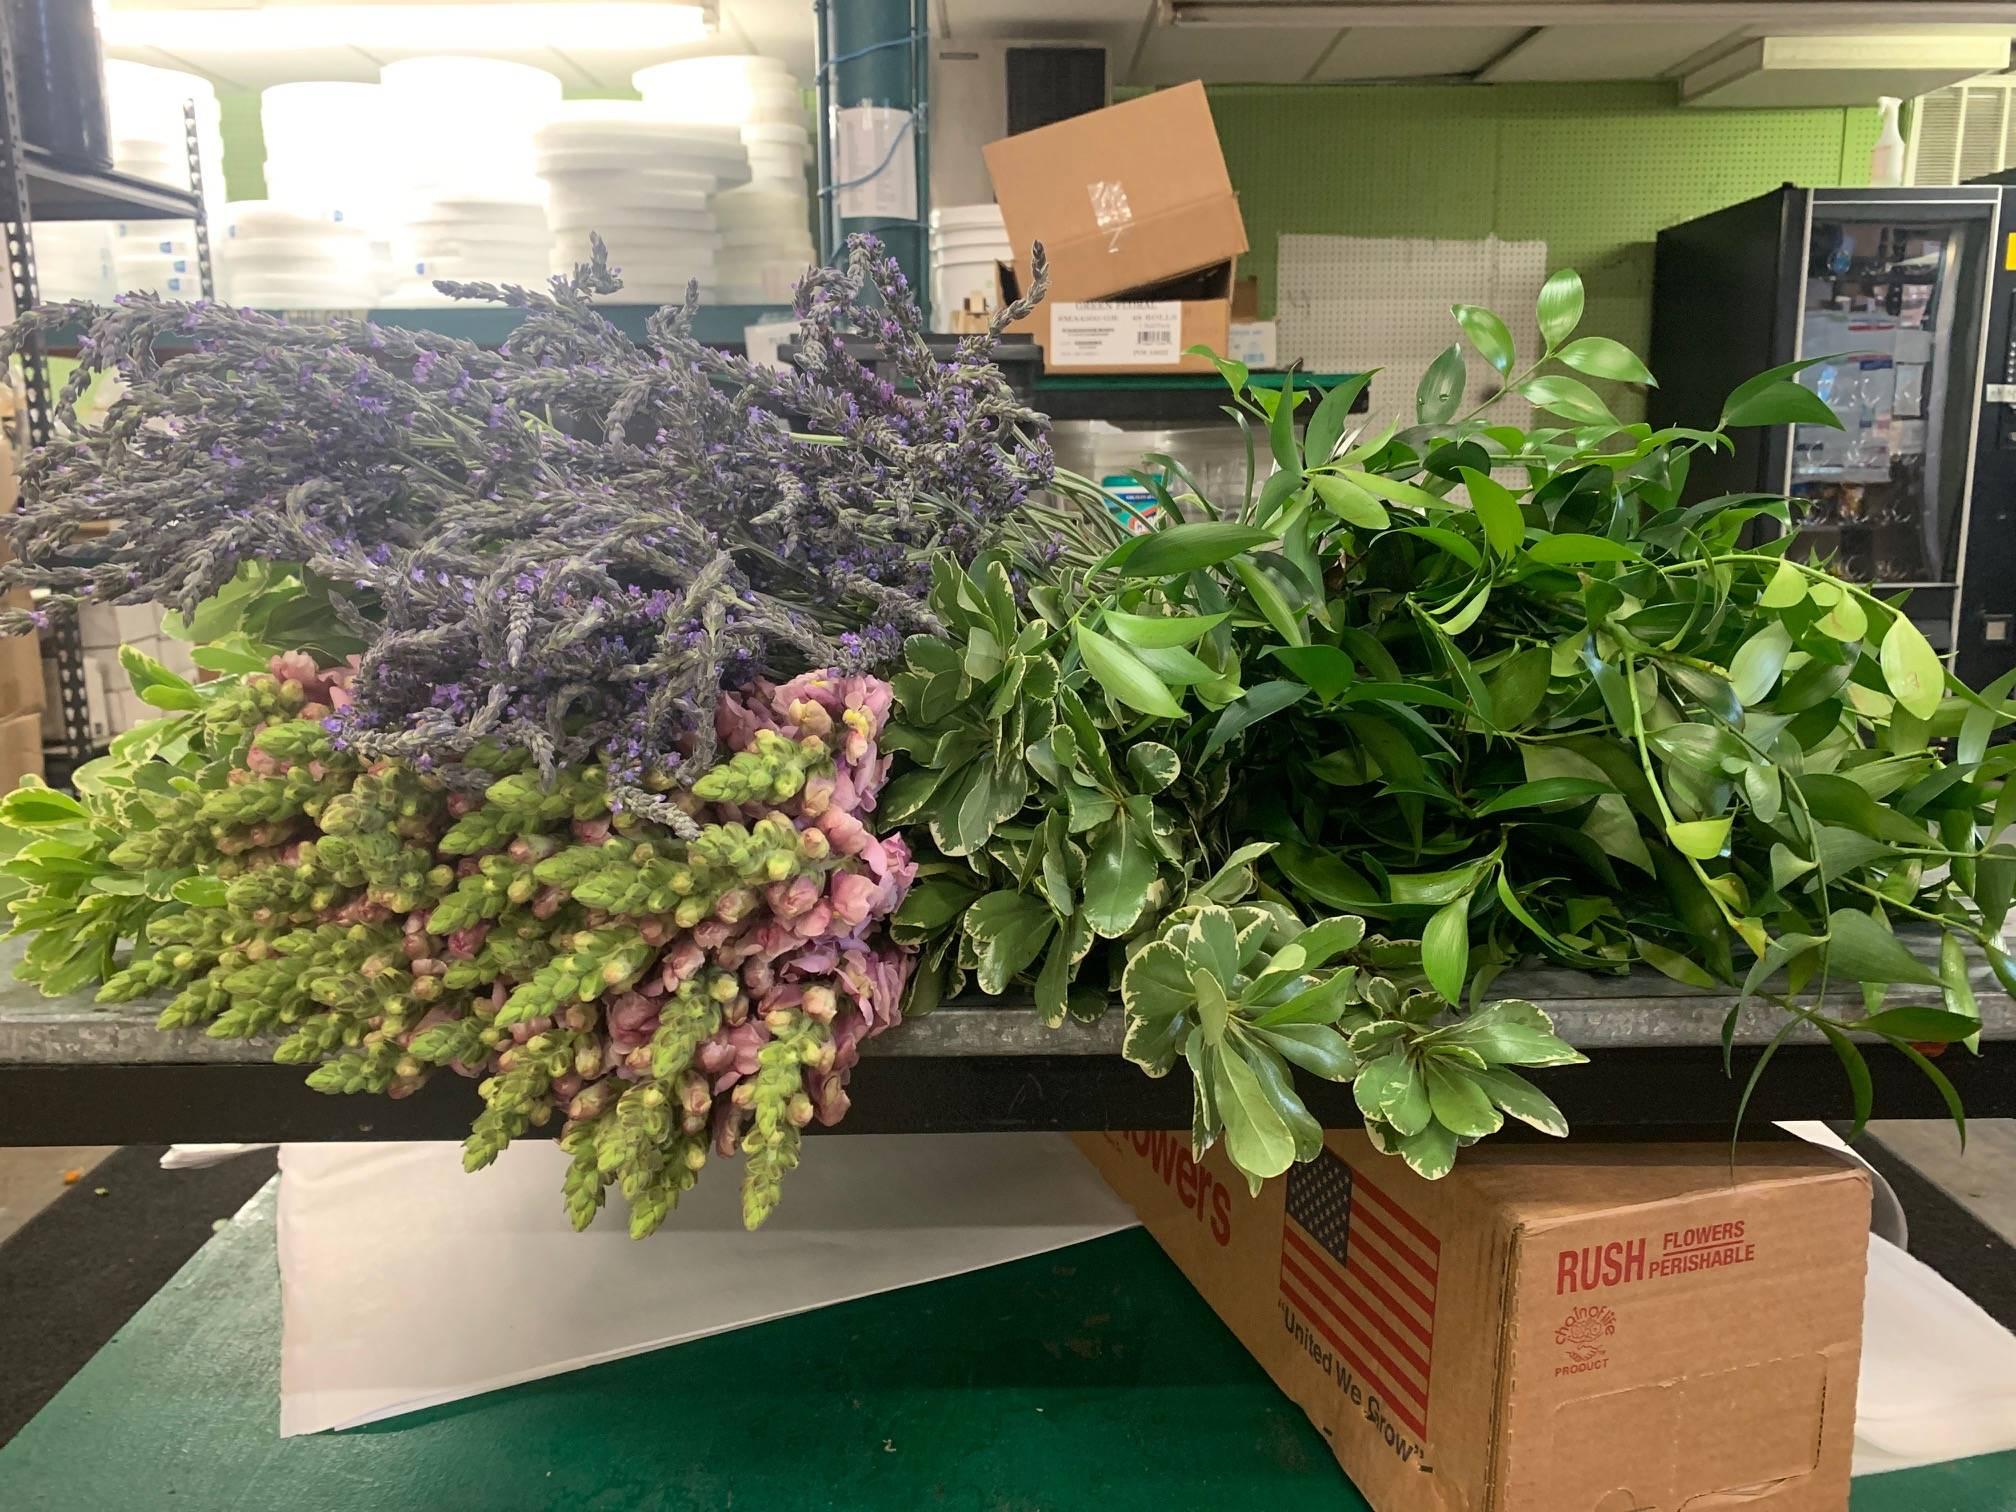 Nagi, mauve snapdragons, fresh lavender flower